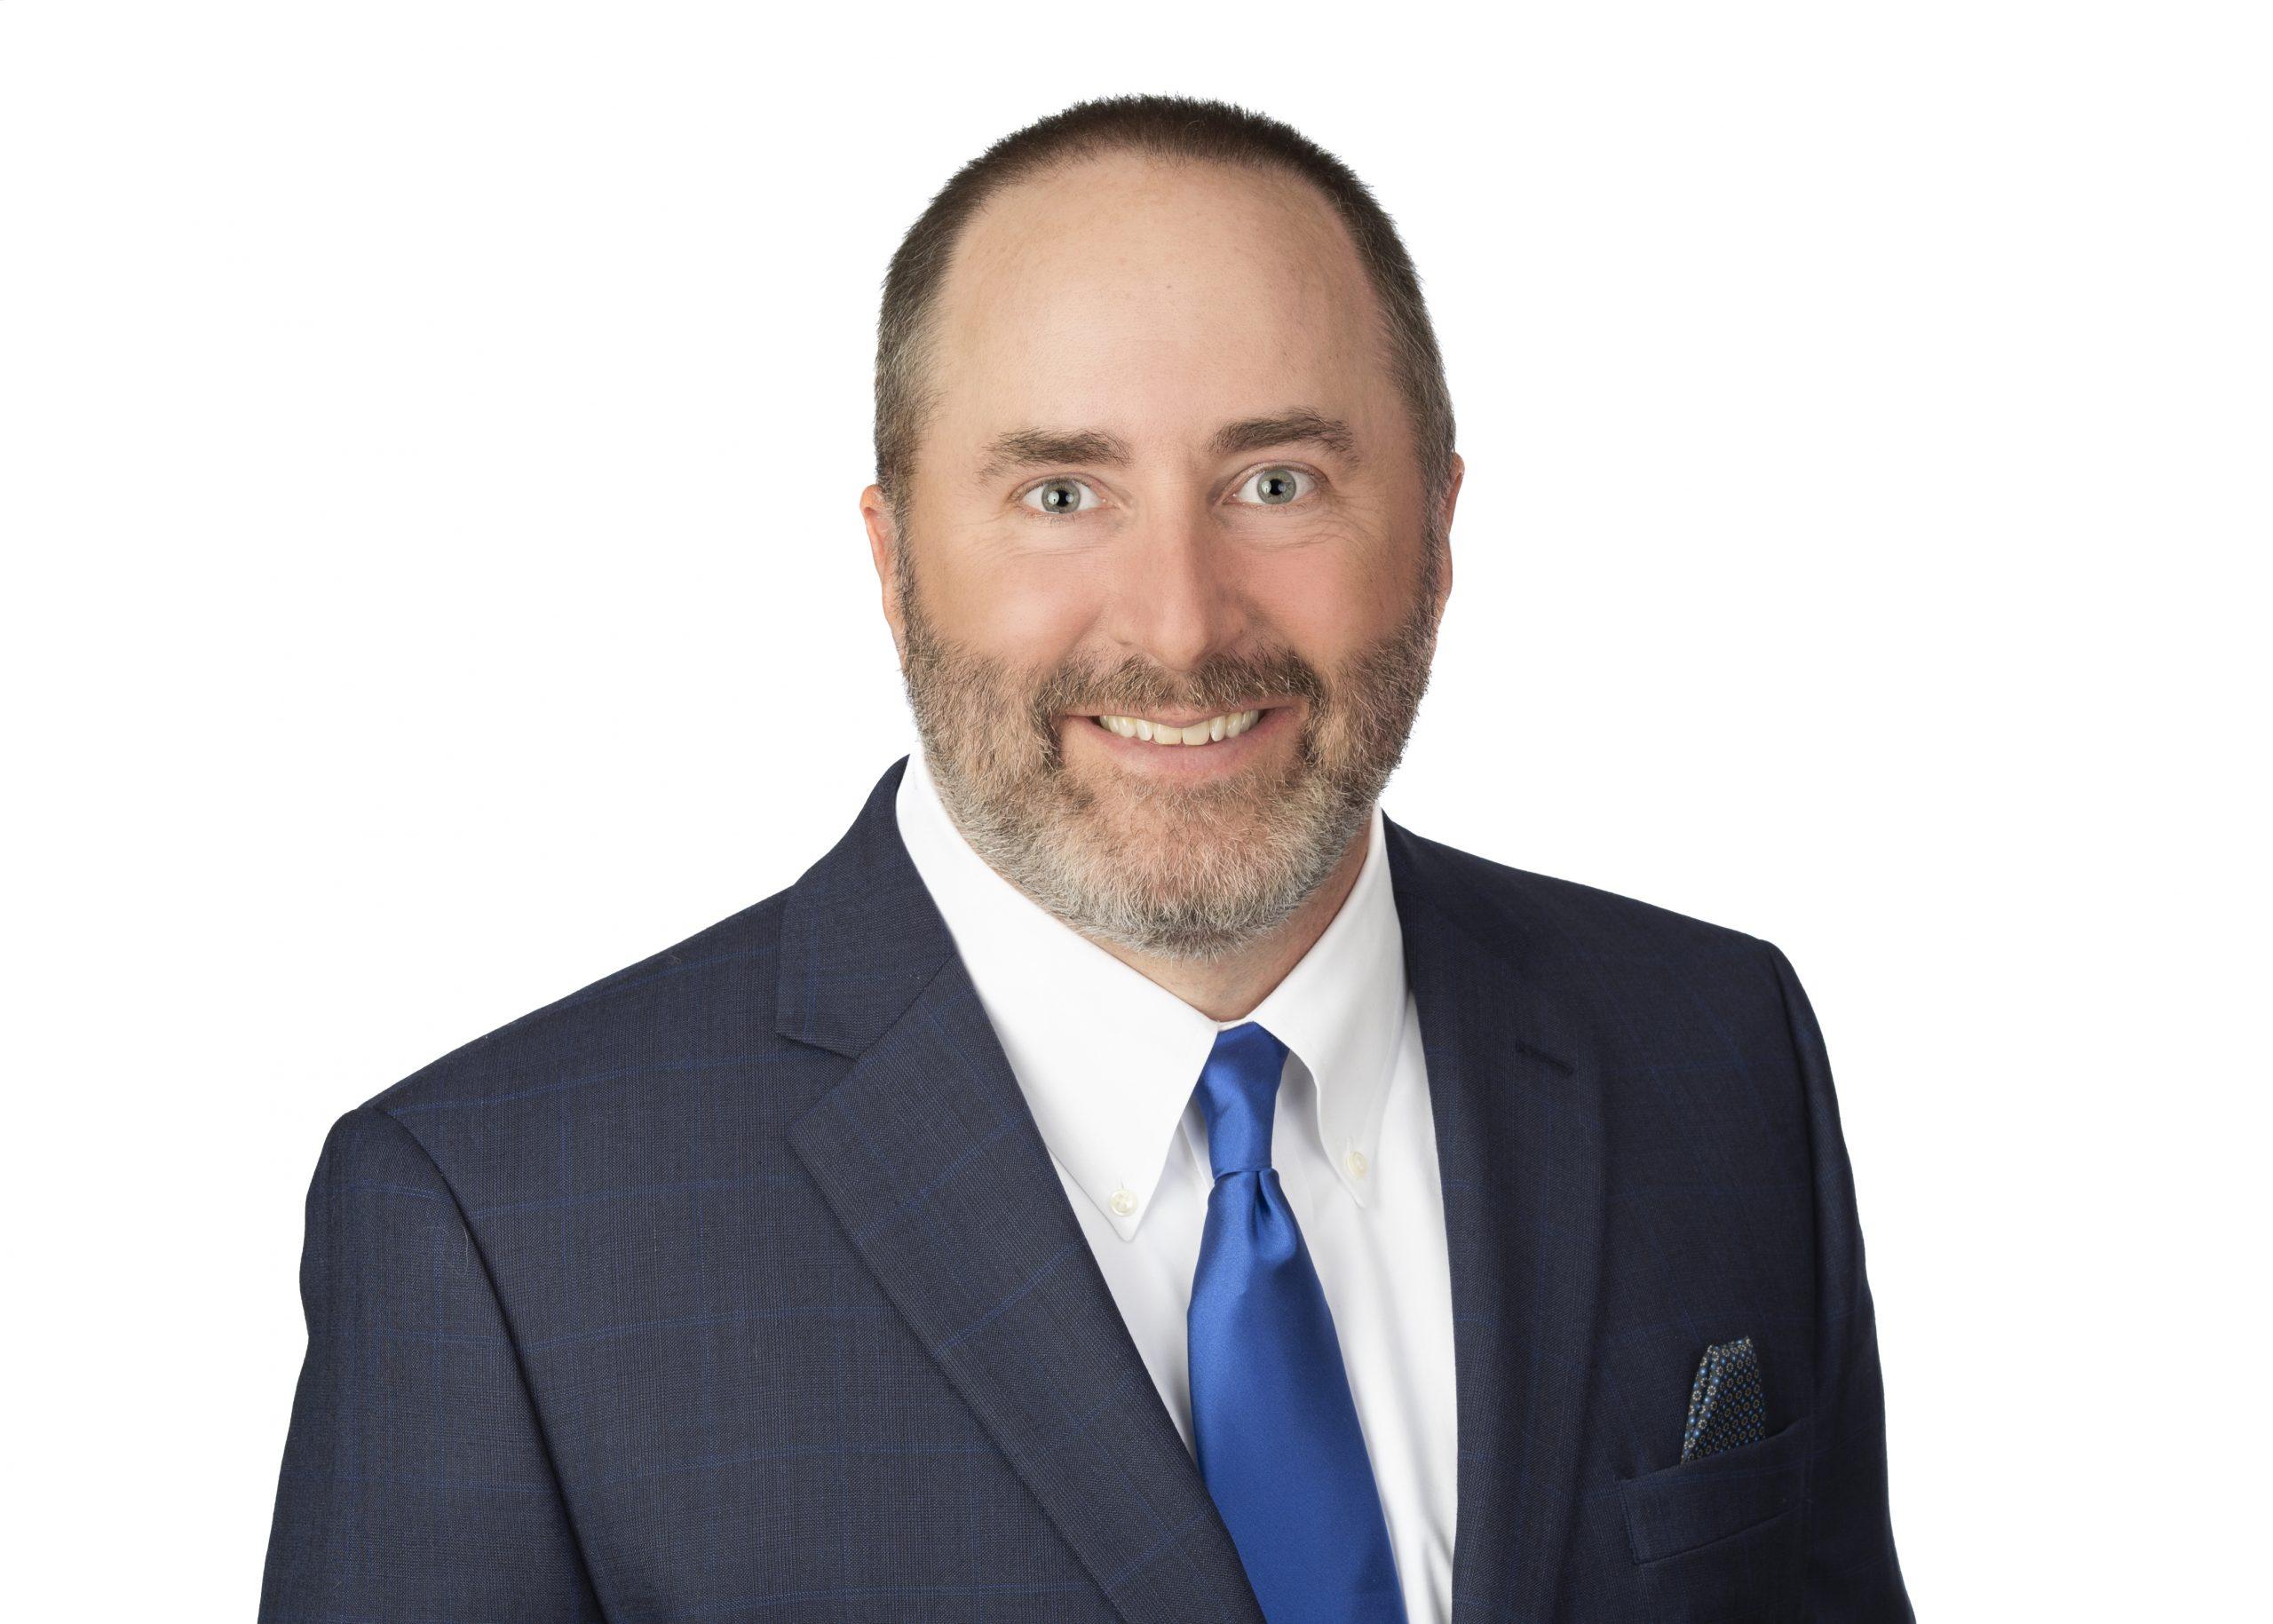 Derek J. Reynolds, JD, MBA, BSCS